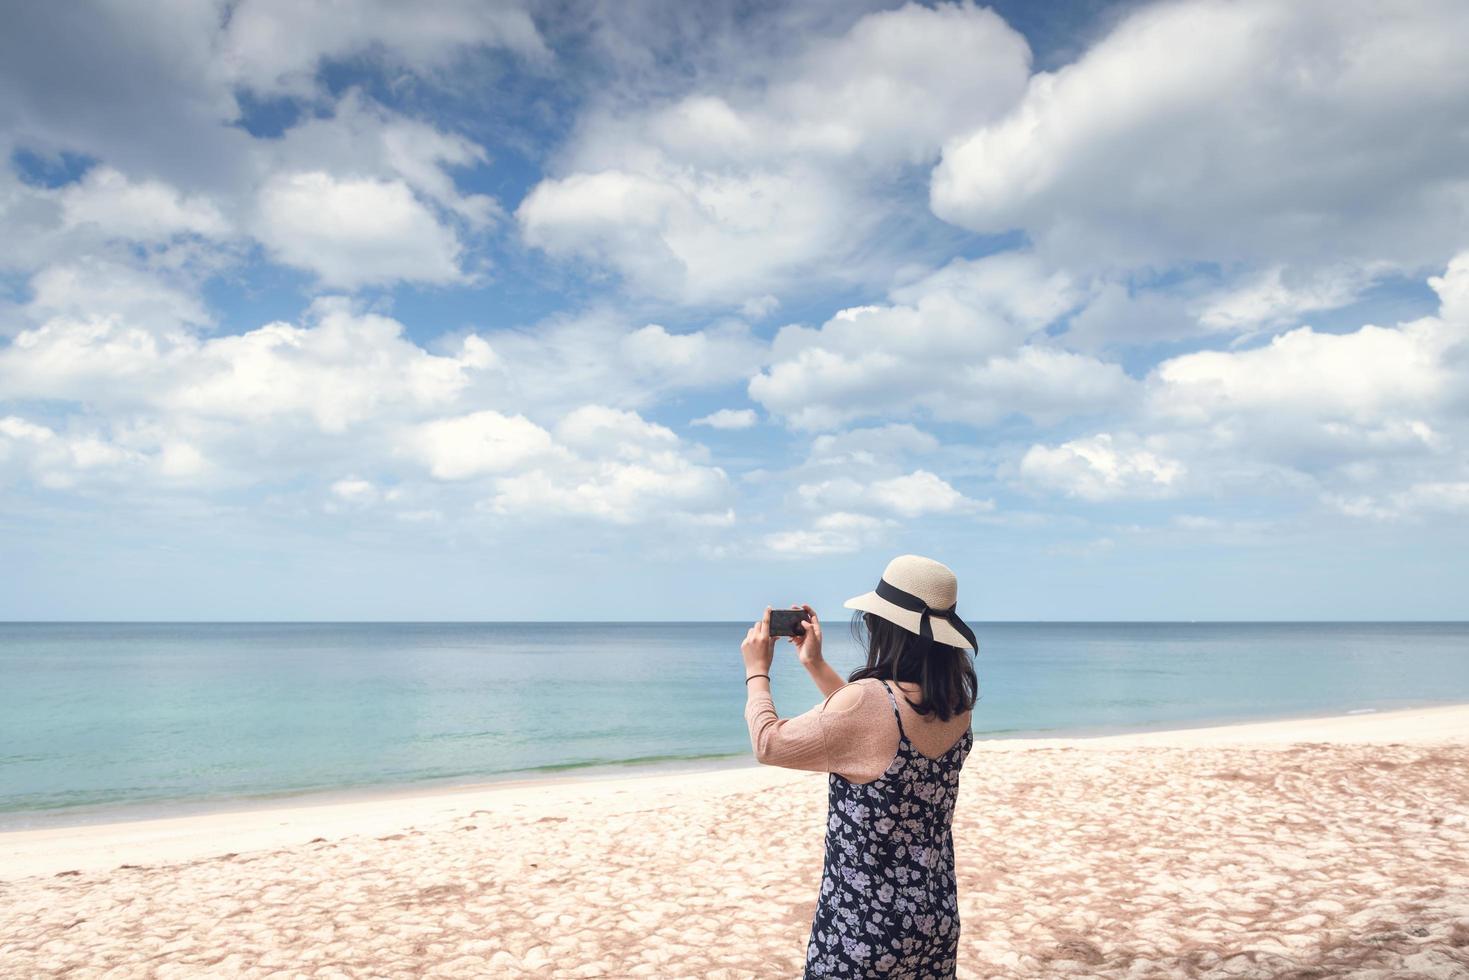 Woman taking photograph at beach photo